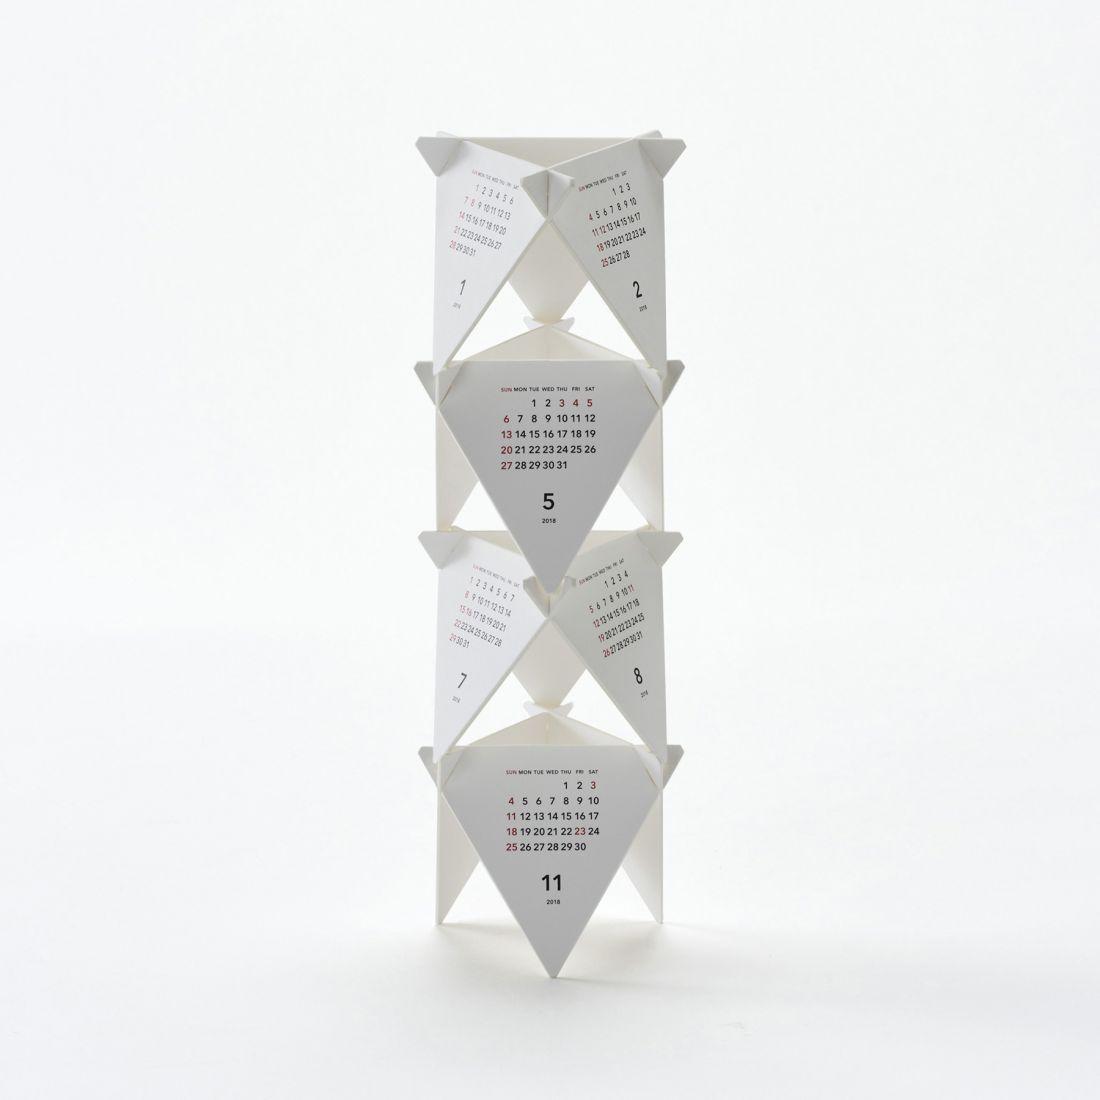 Tri-leg calendar by Katsumi Tamura